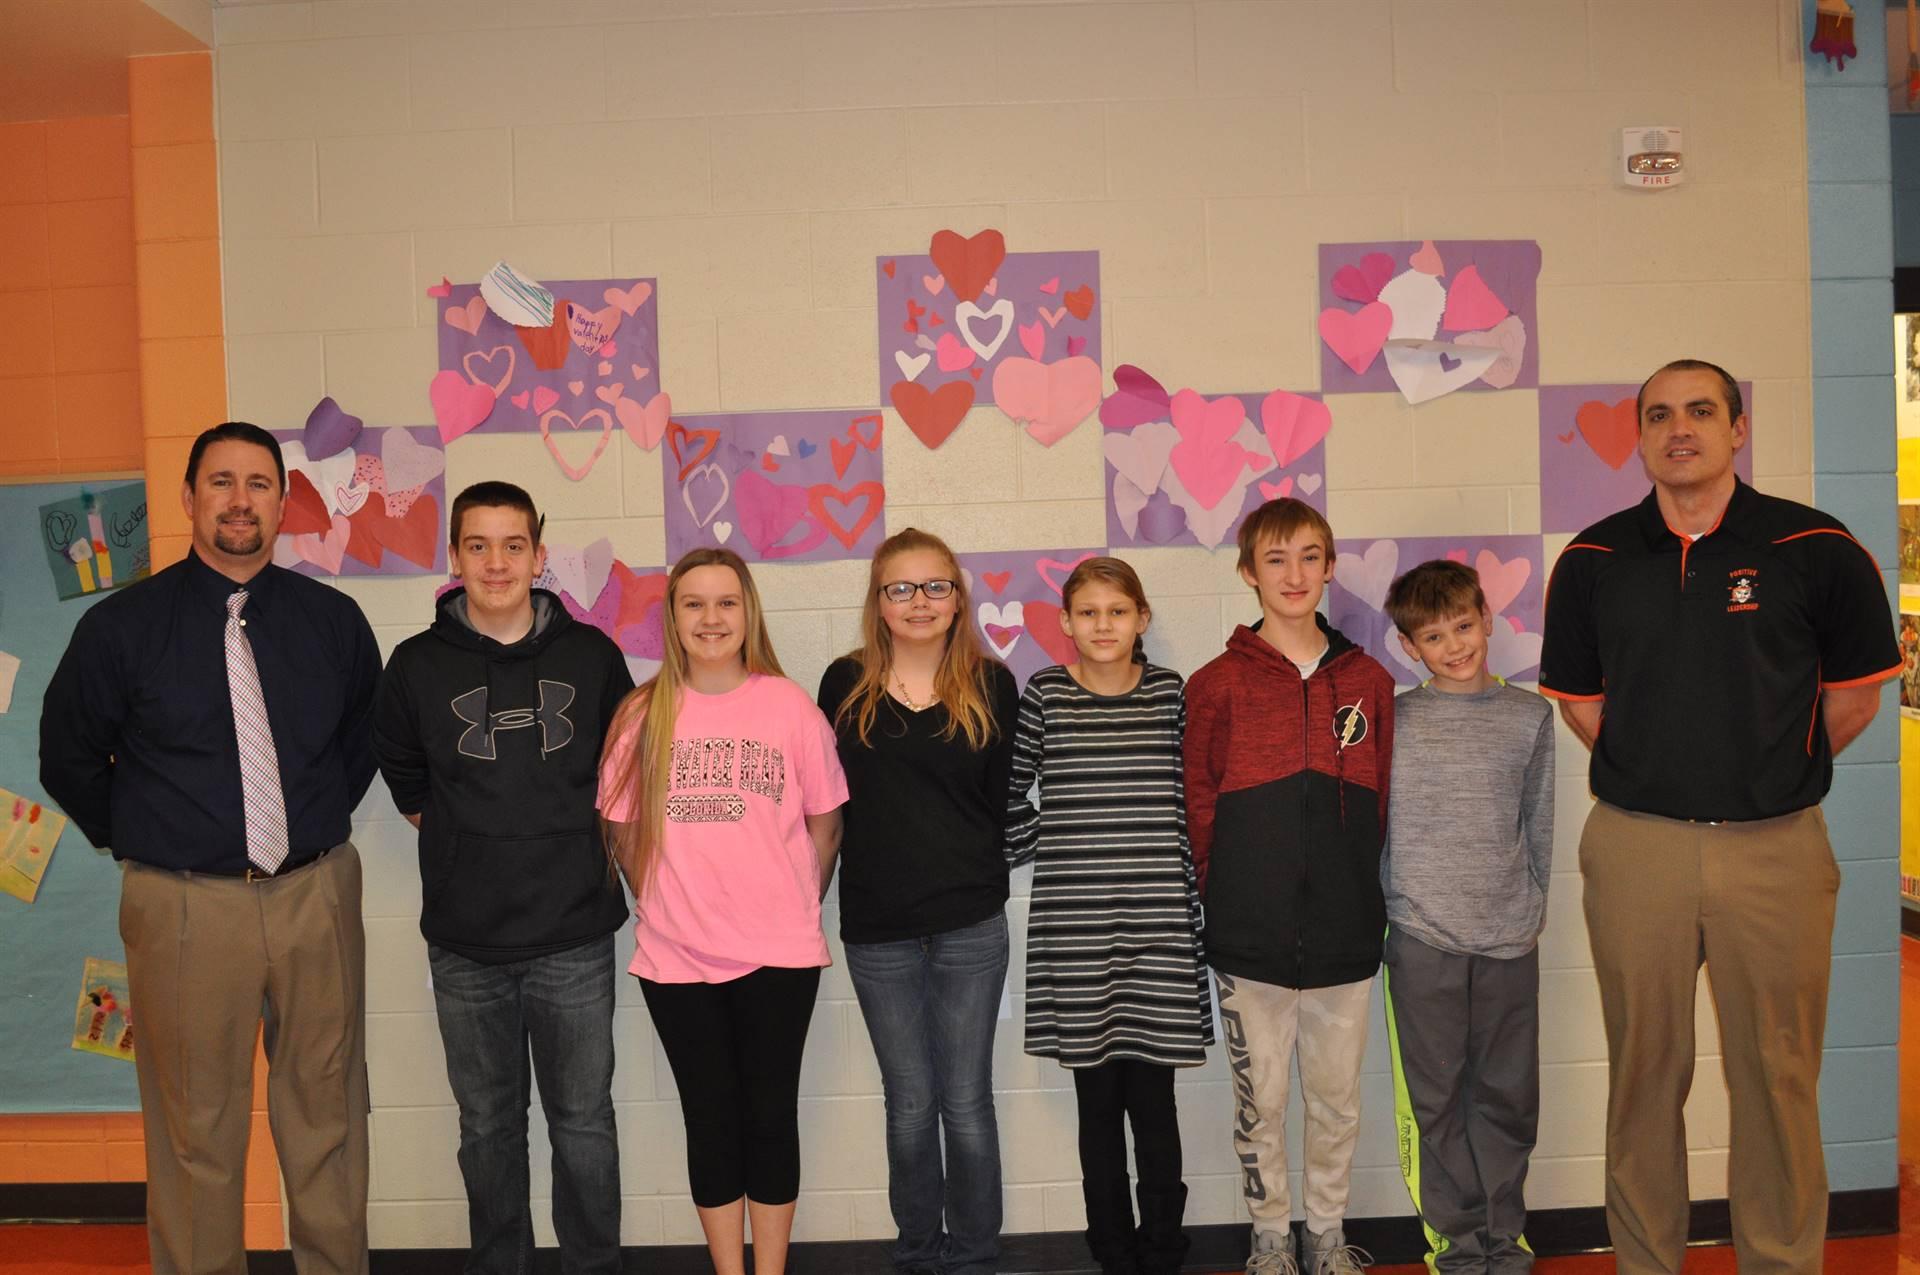 Feb PRIDE students